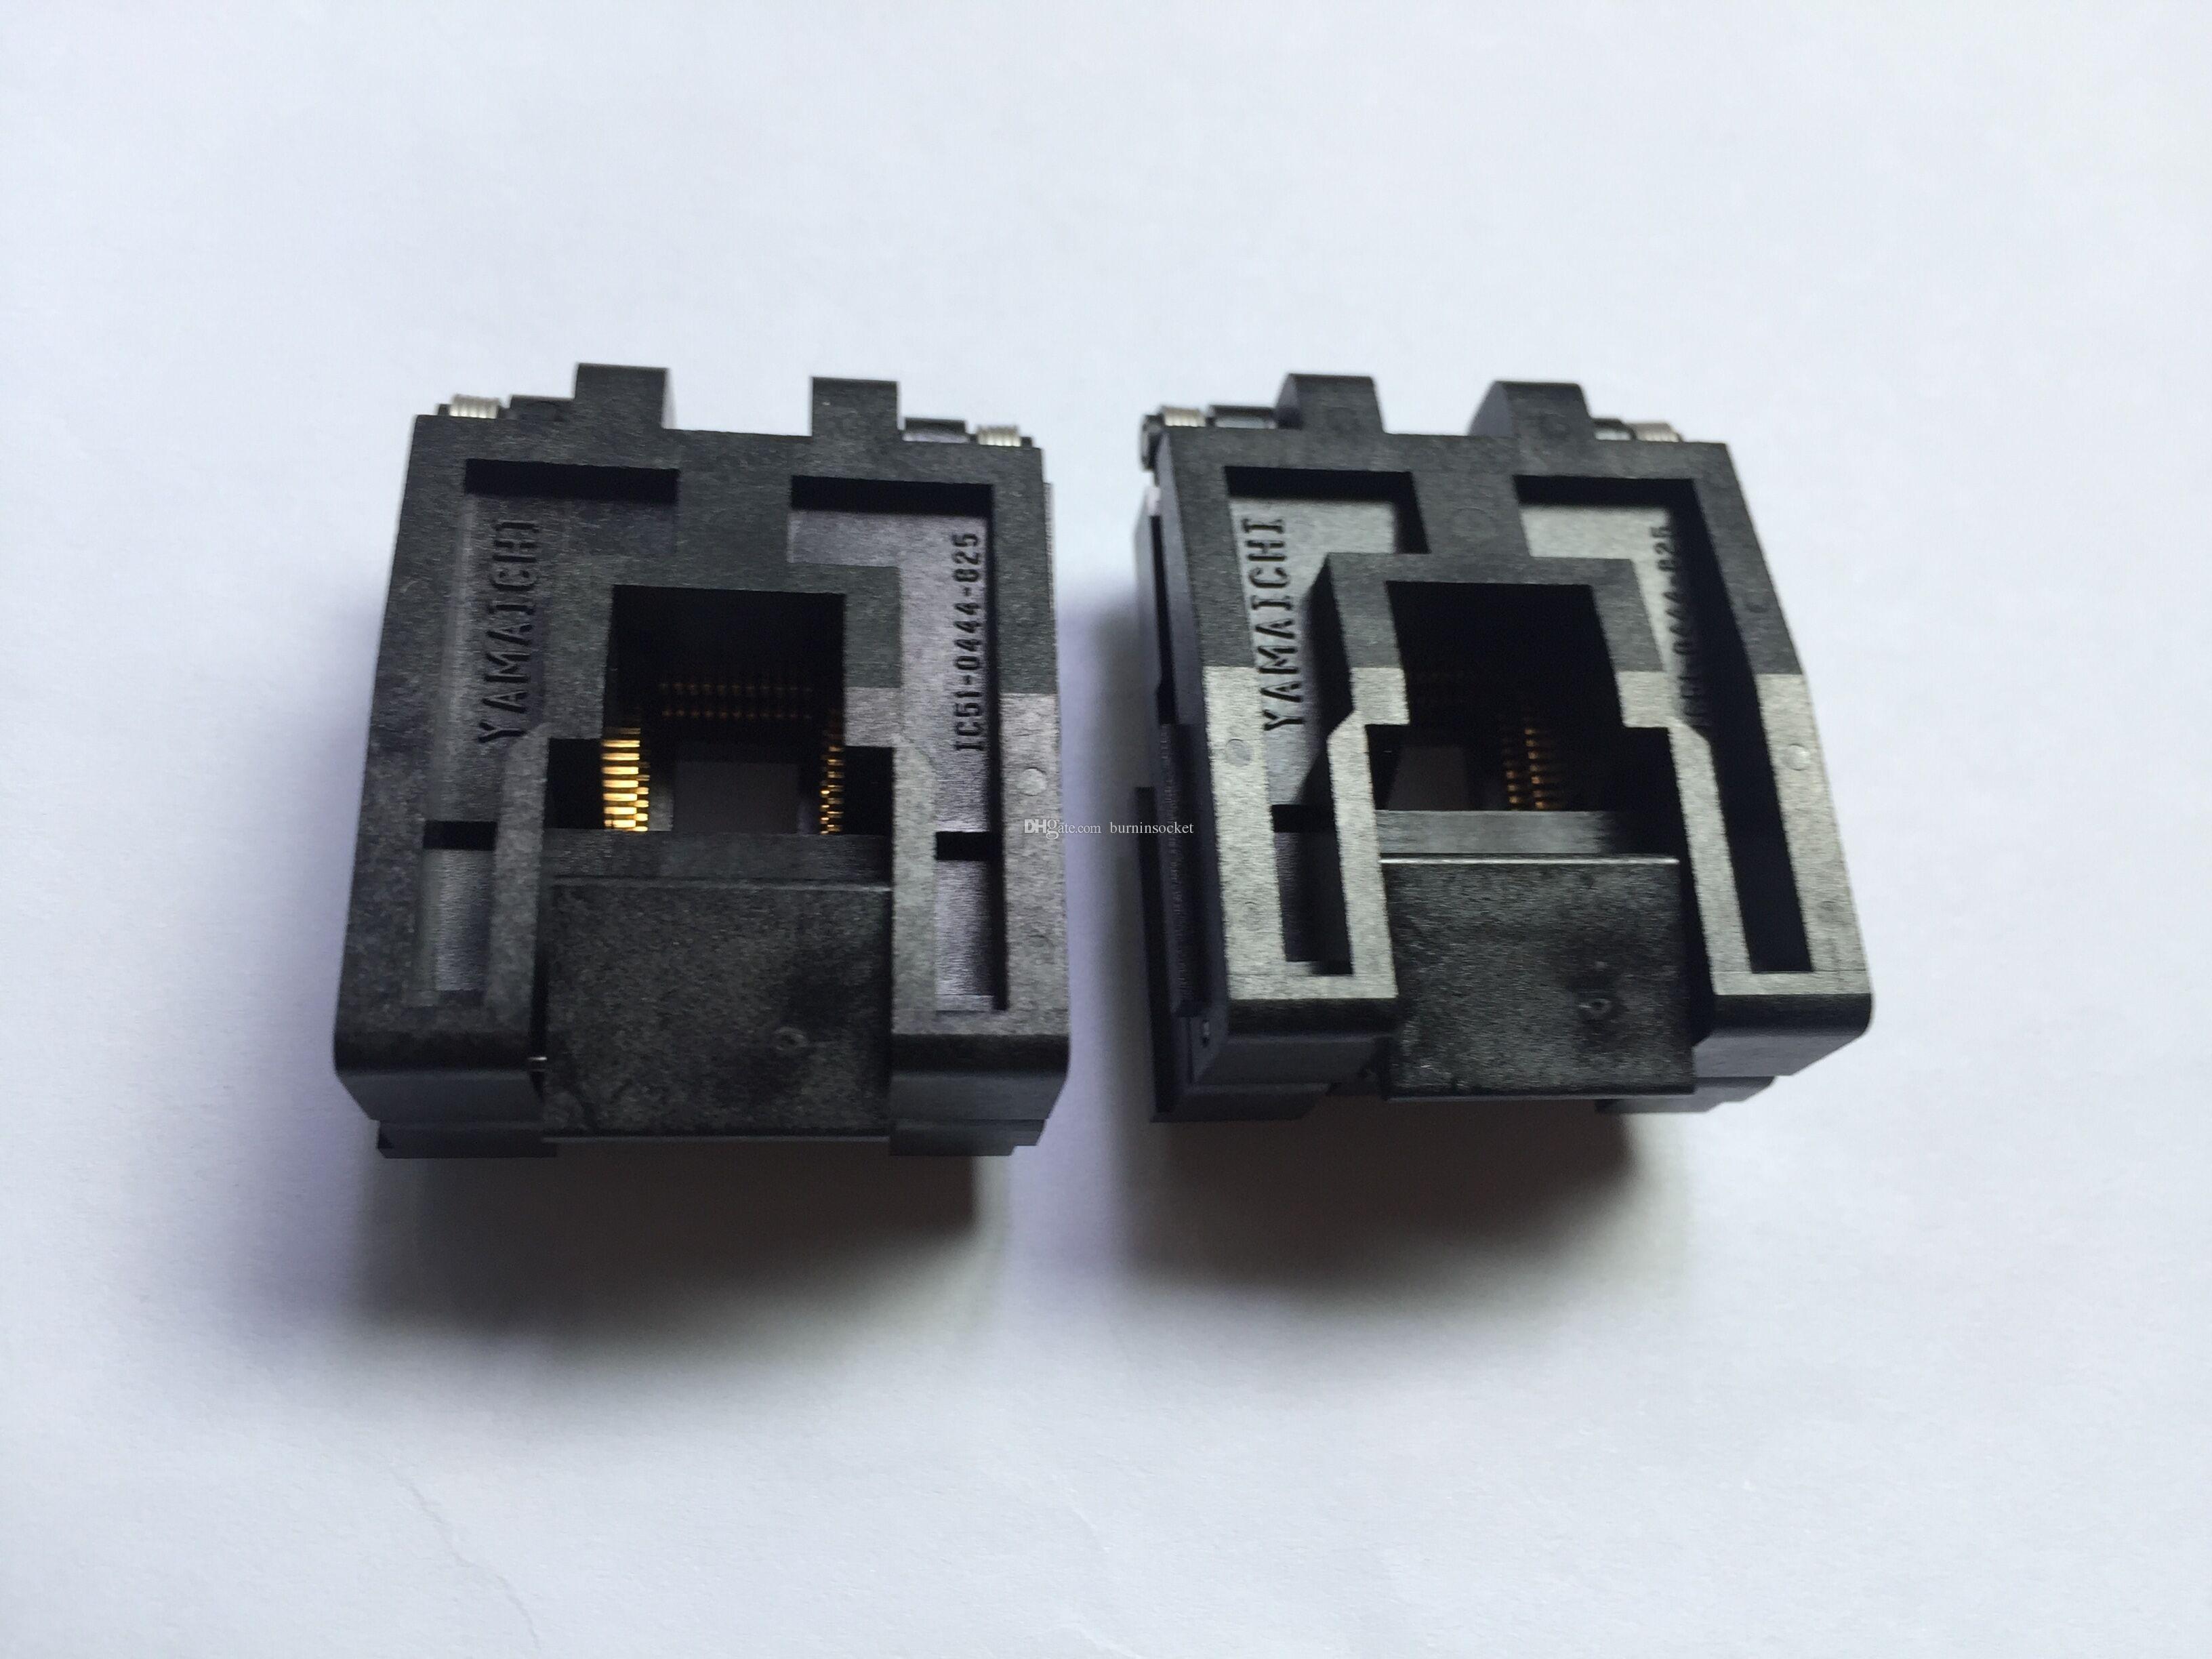 IC51-0444-825 Yamaichi IC Test Socket QFP48pin passo 0,8 mm IC bodys formato 10x10mm bruciare in presa